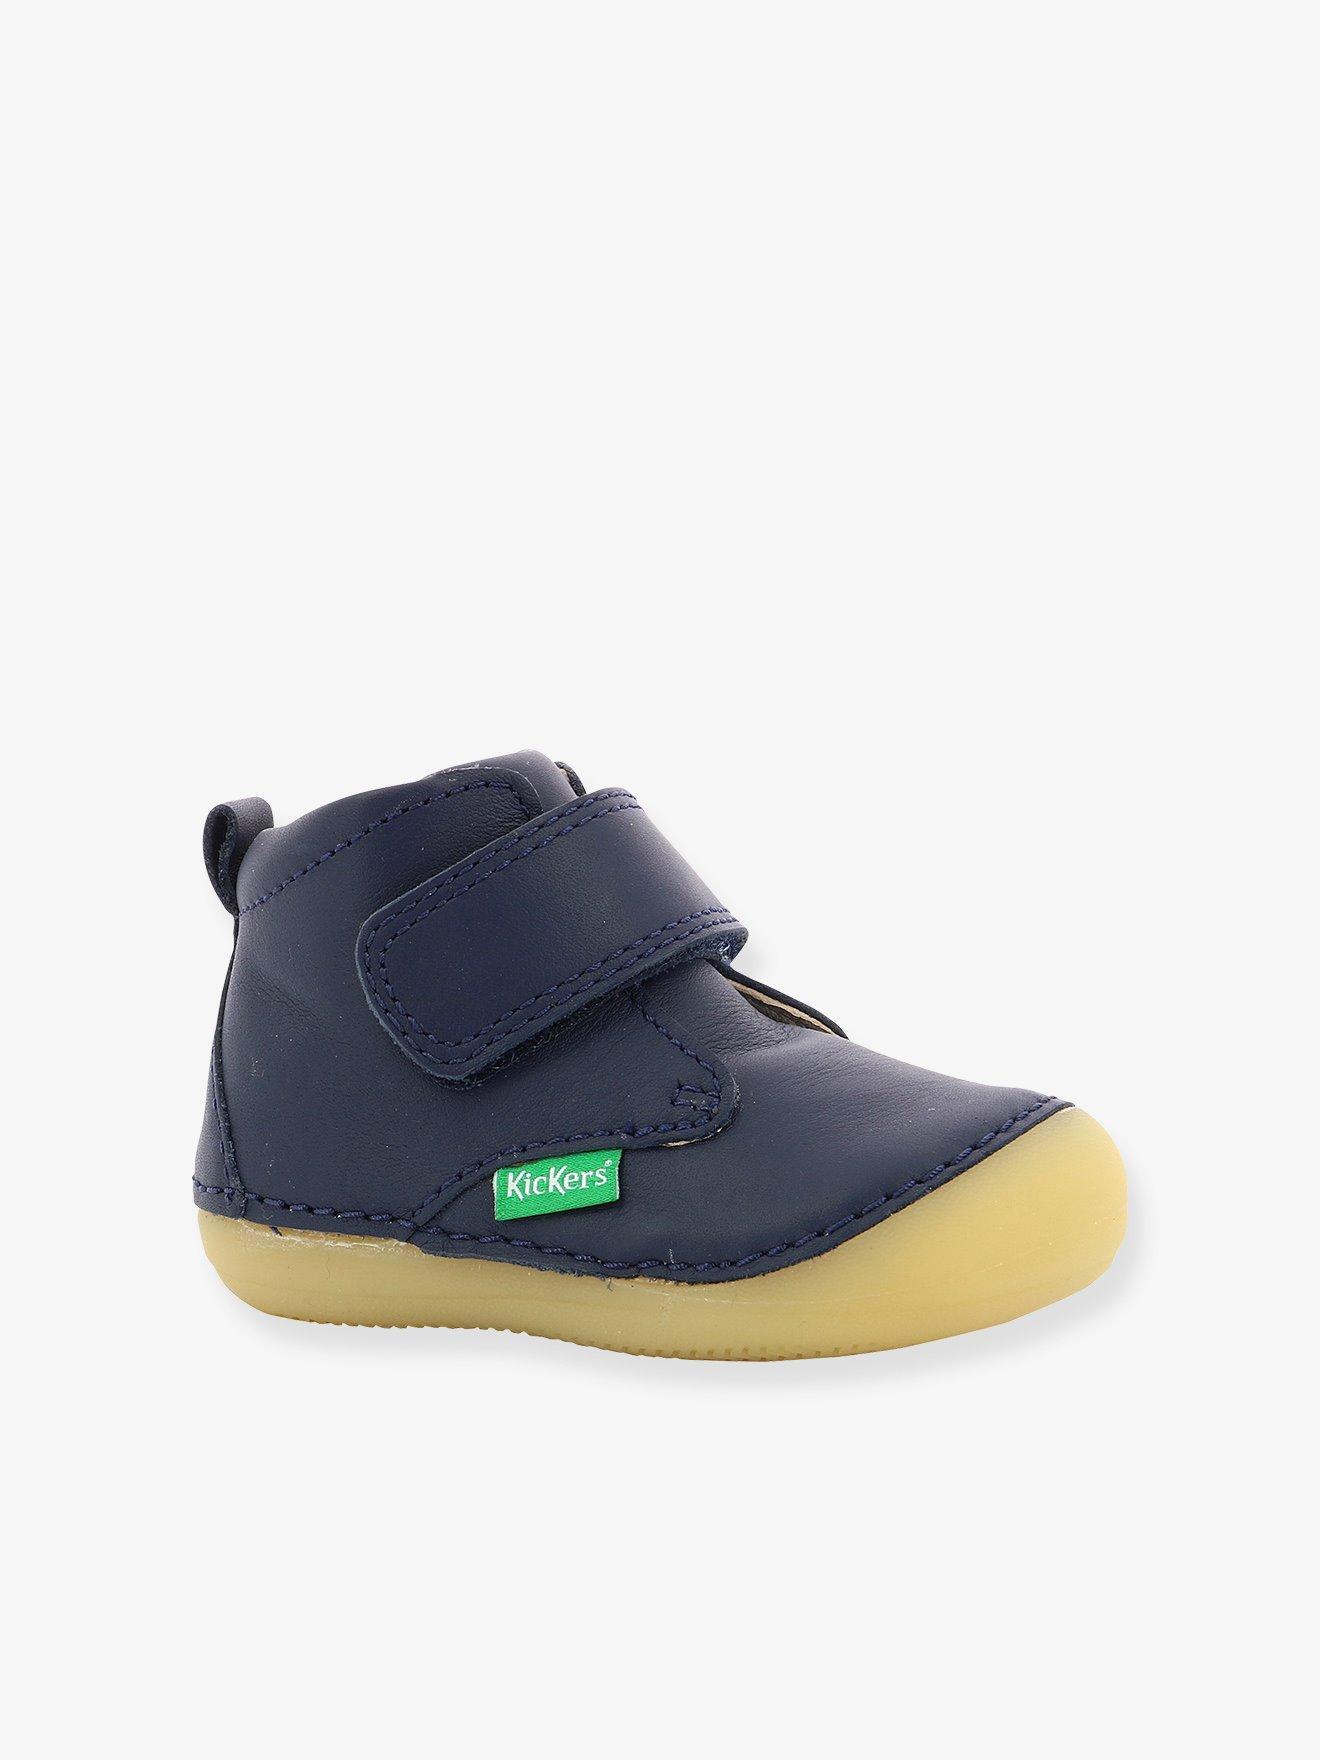 aba8611db Botines bebé sabio ® azul oscuro liso. Kickers